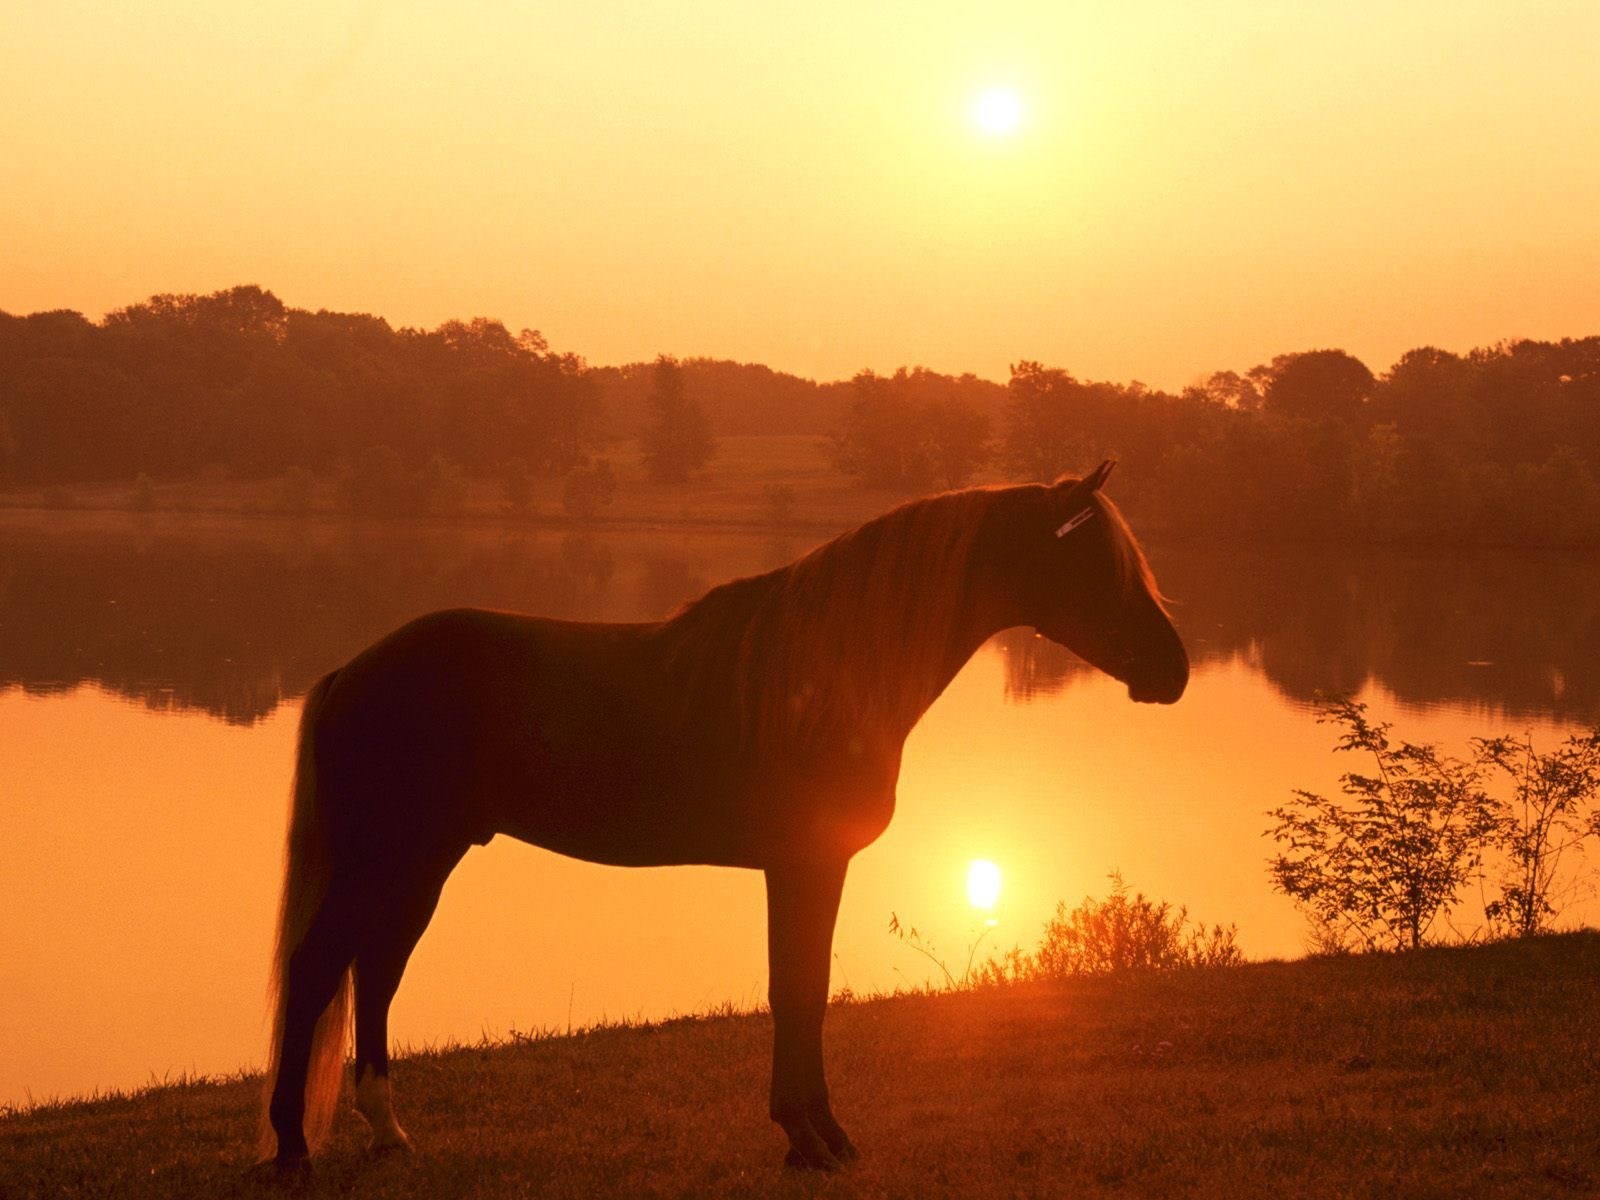 Beautiful Wallpaper Horse Desktop Background - 0e46541b02a83e04c4e7f42707599a18  You Should Have_485685.jpg